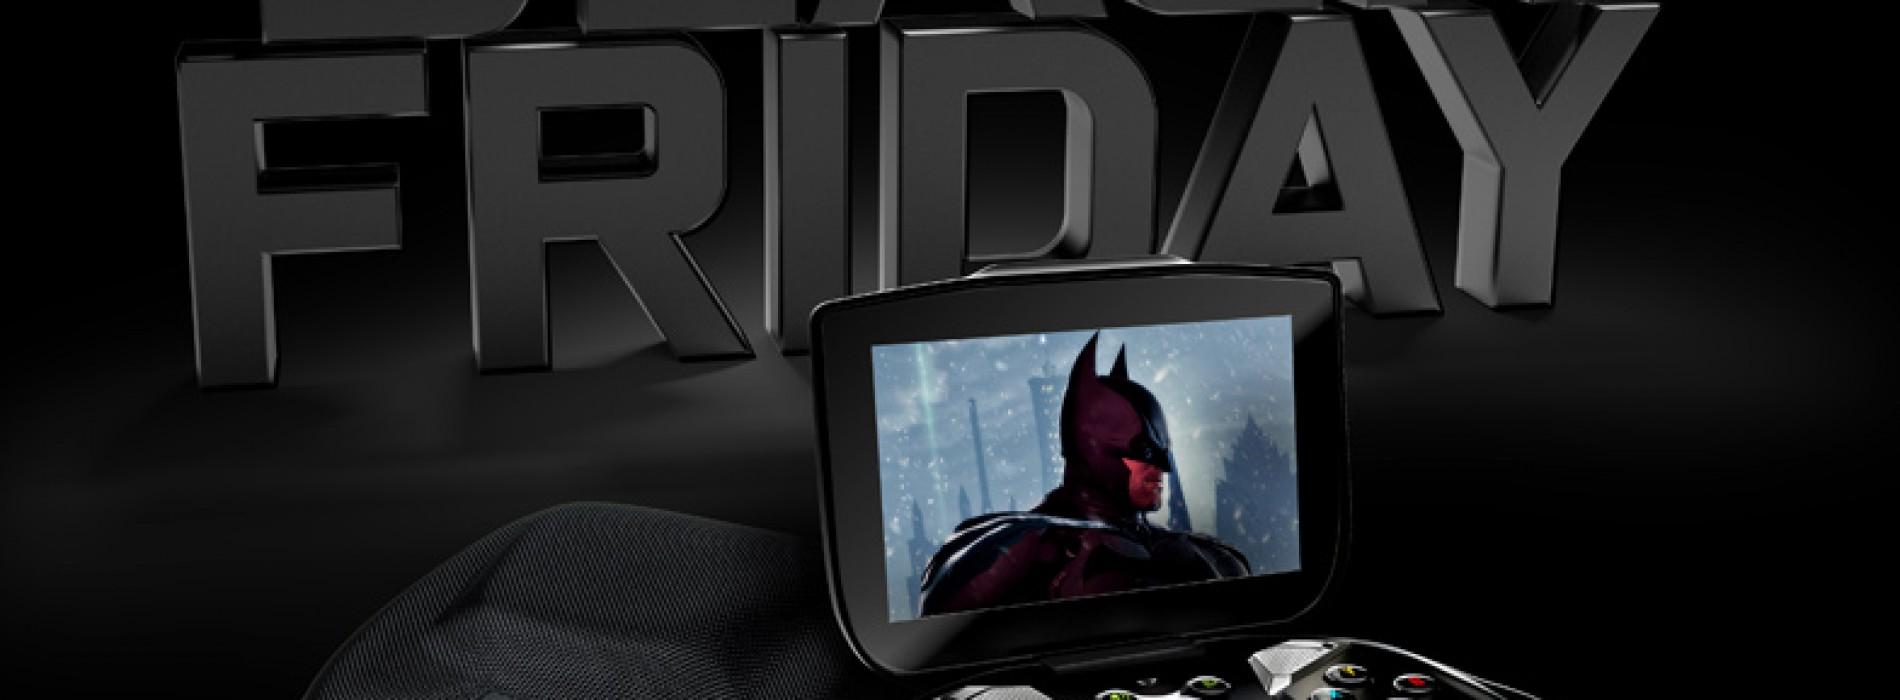 NVIDIA slashes $50 off Shield for Black Friday